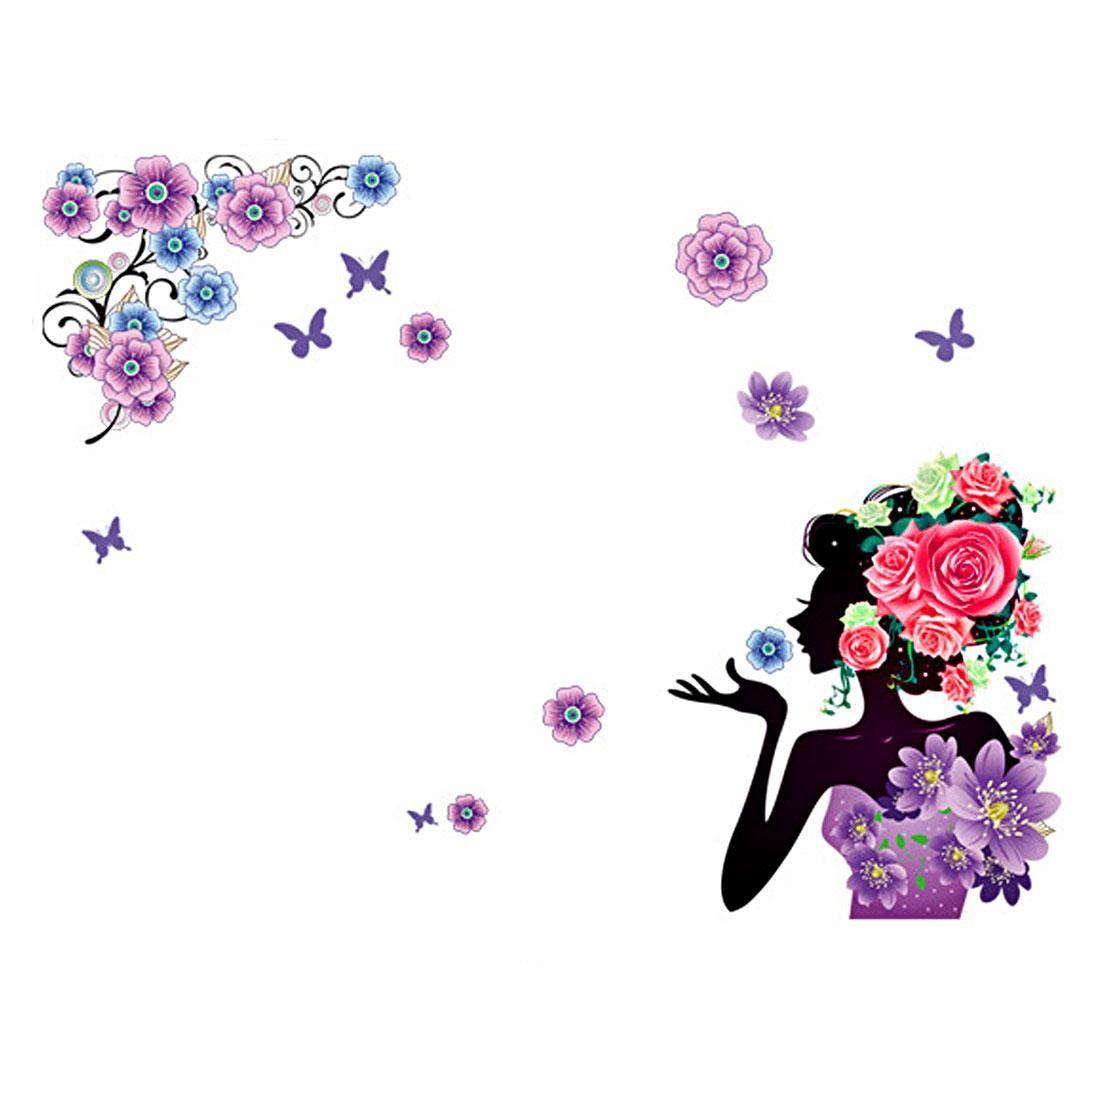 DIY Room Girl Flower Removable Wall Art Sticker Vinyl Decal Home Decor Mural